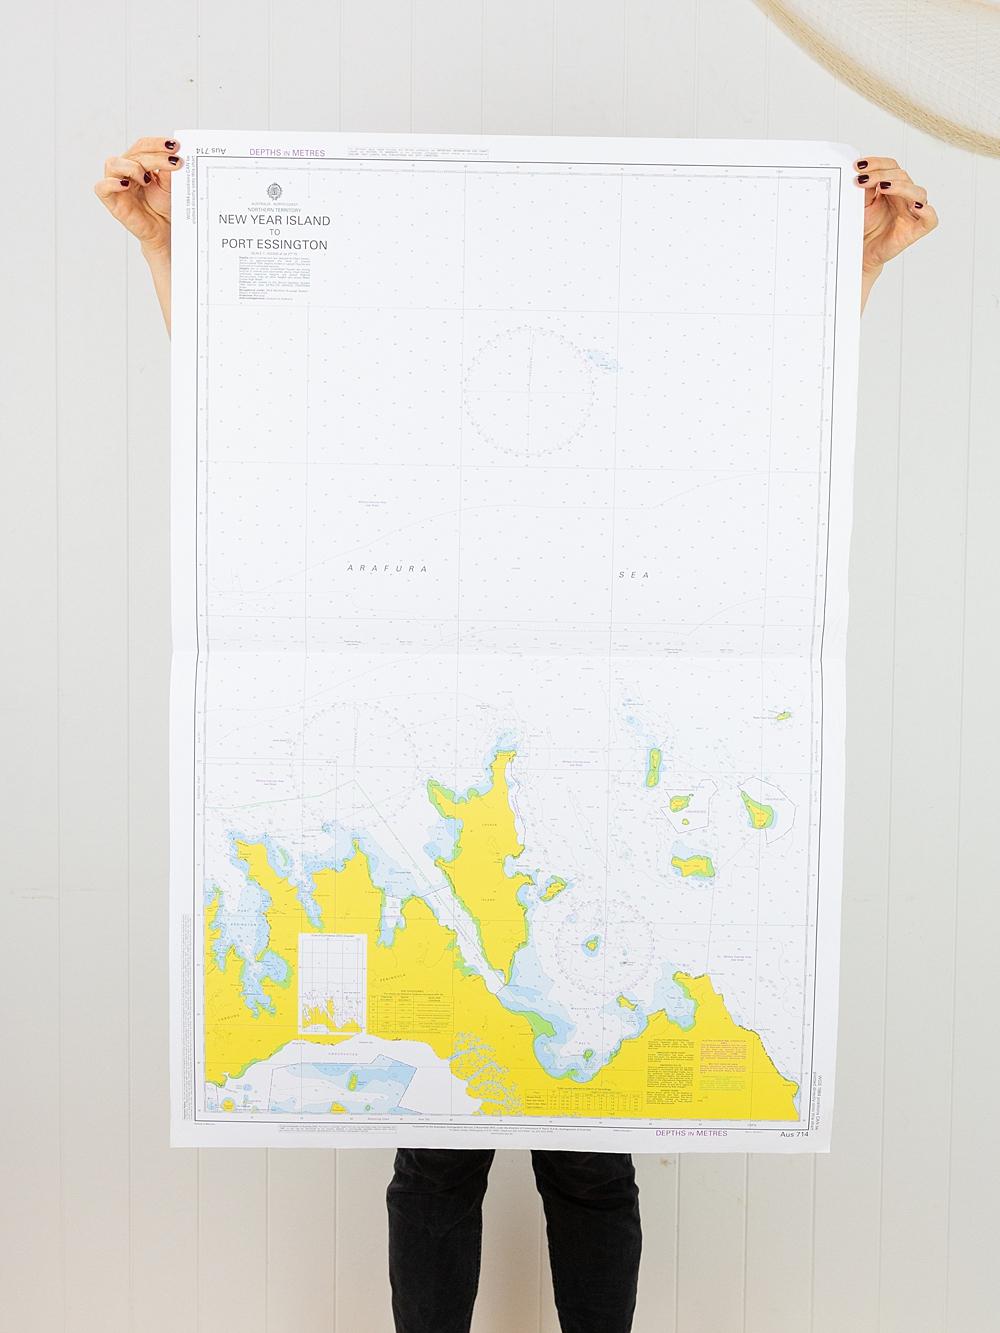 NT - New Year Island to Port Essington  Chart/Map